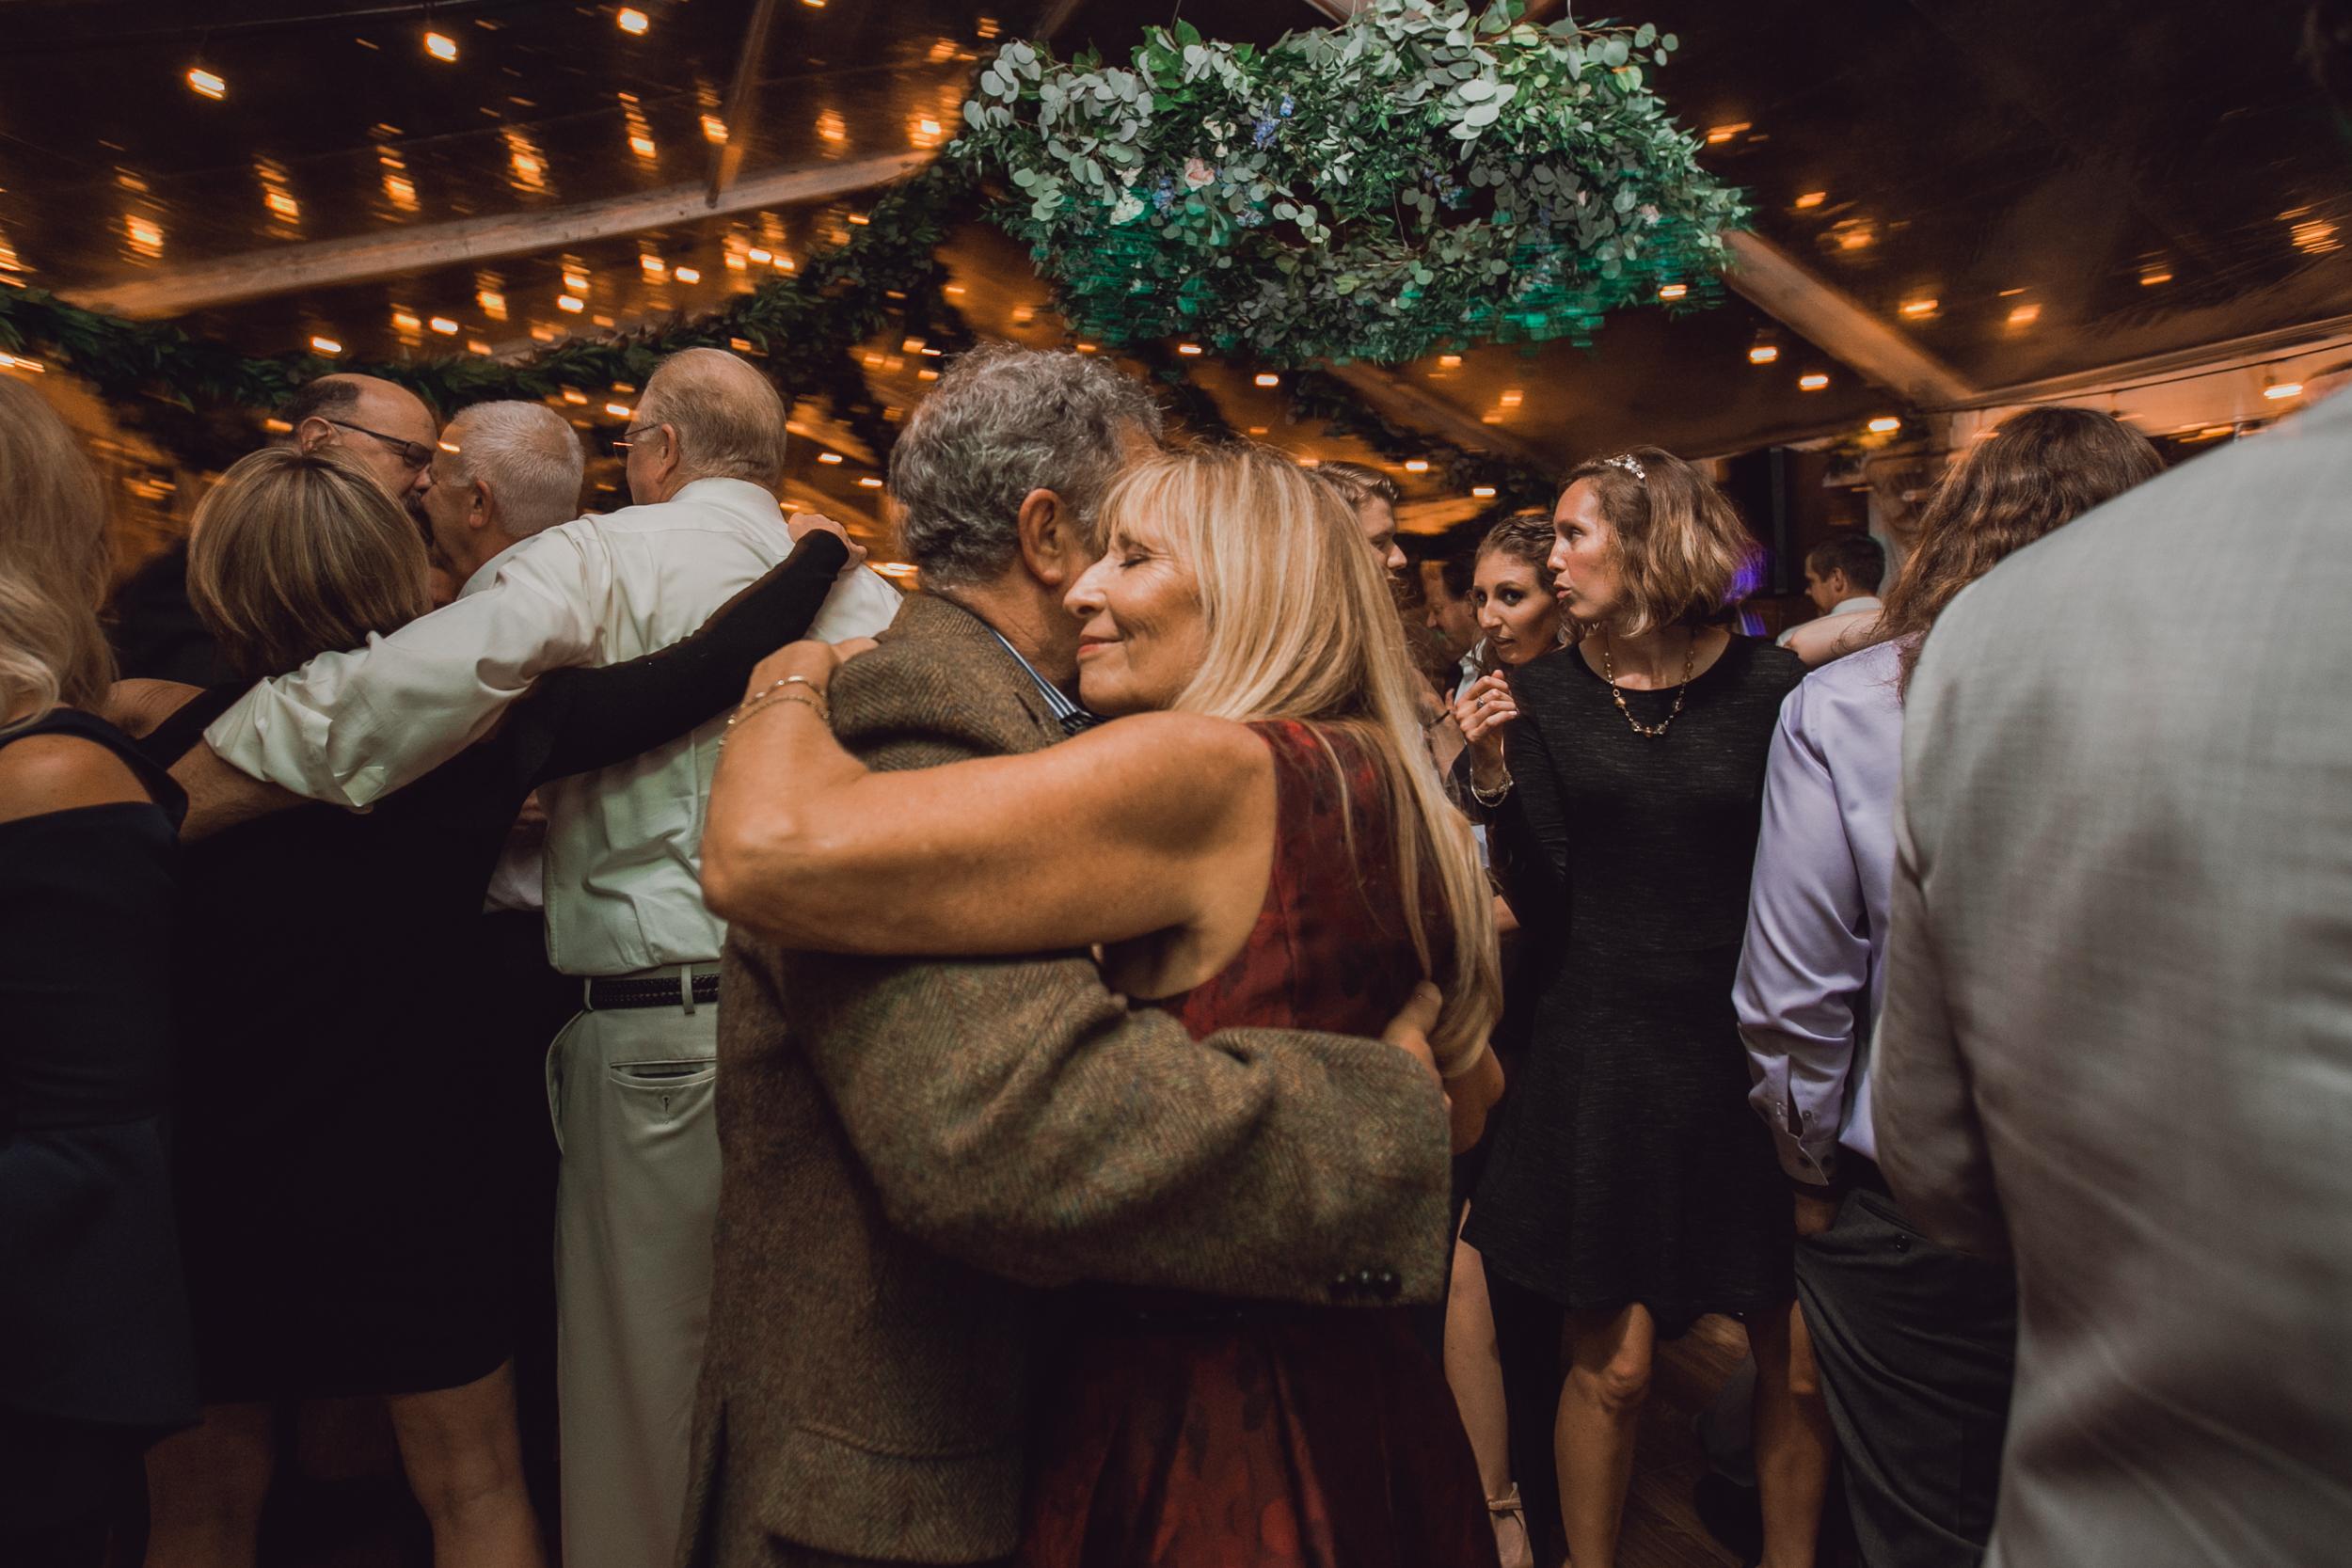 rustic-barn-wedding-dark-moody-minneapolis-6.jpg